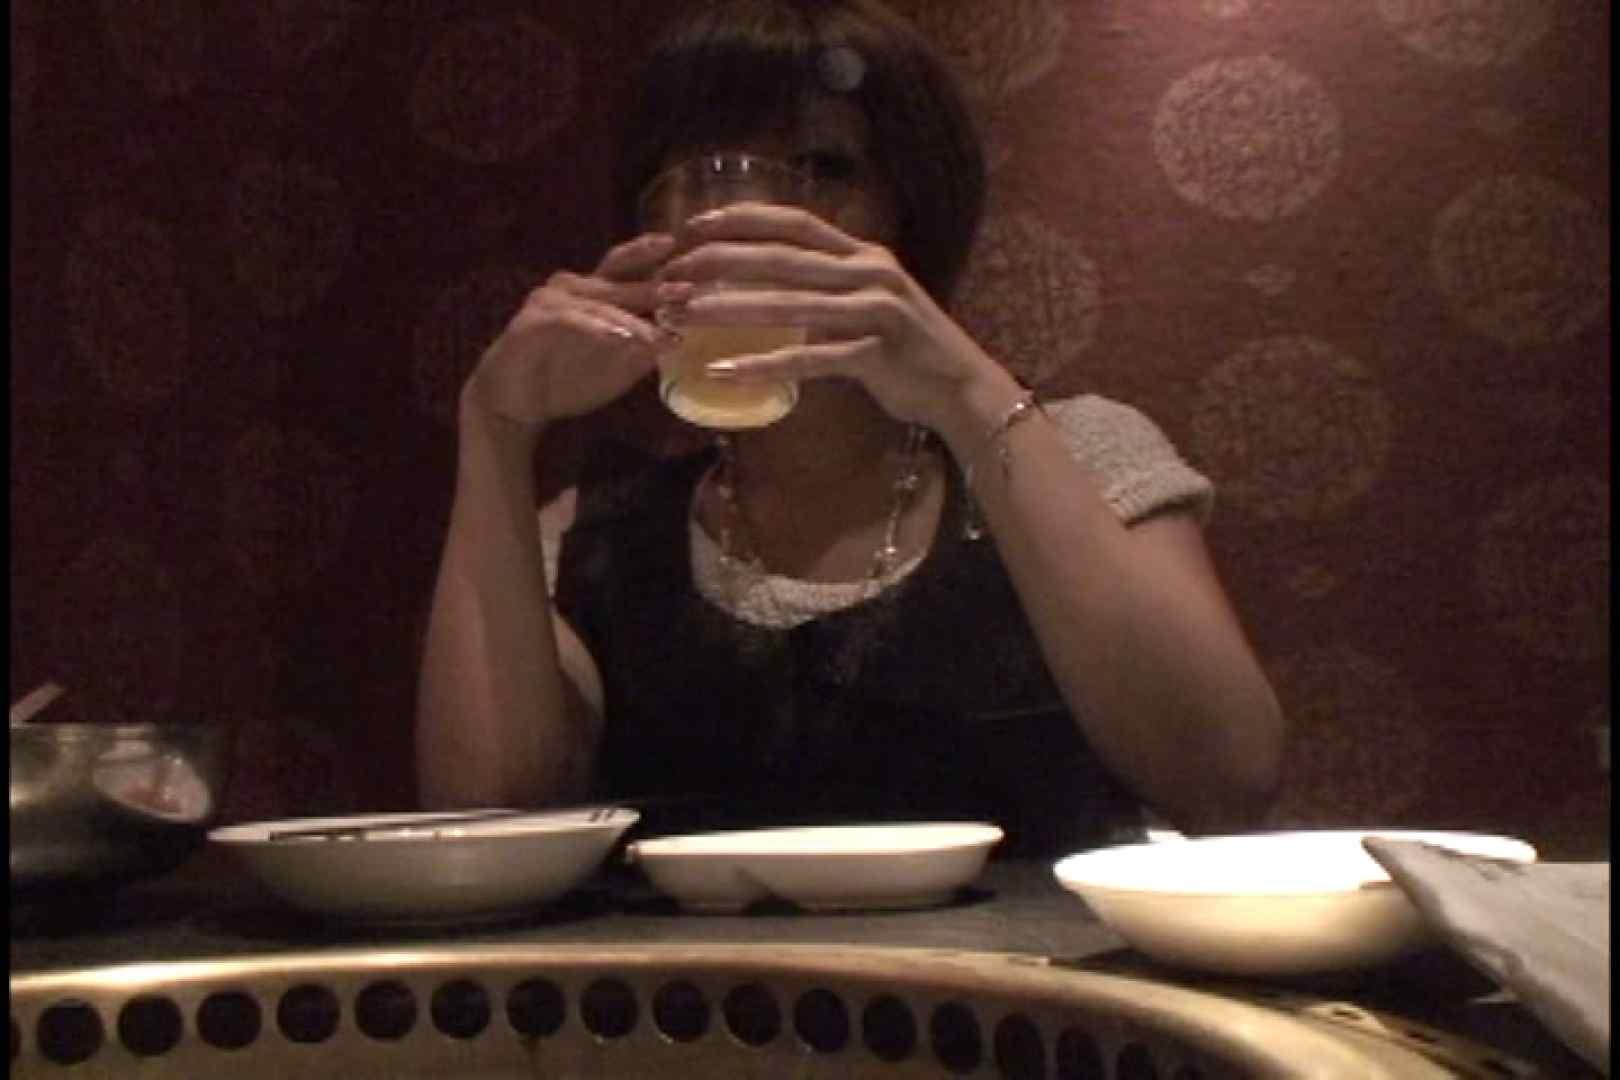 JDハンター全国ツアー vol.026 前編 女子大生のエロ生活   OLのエロ生活  104連発 55